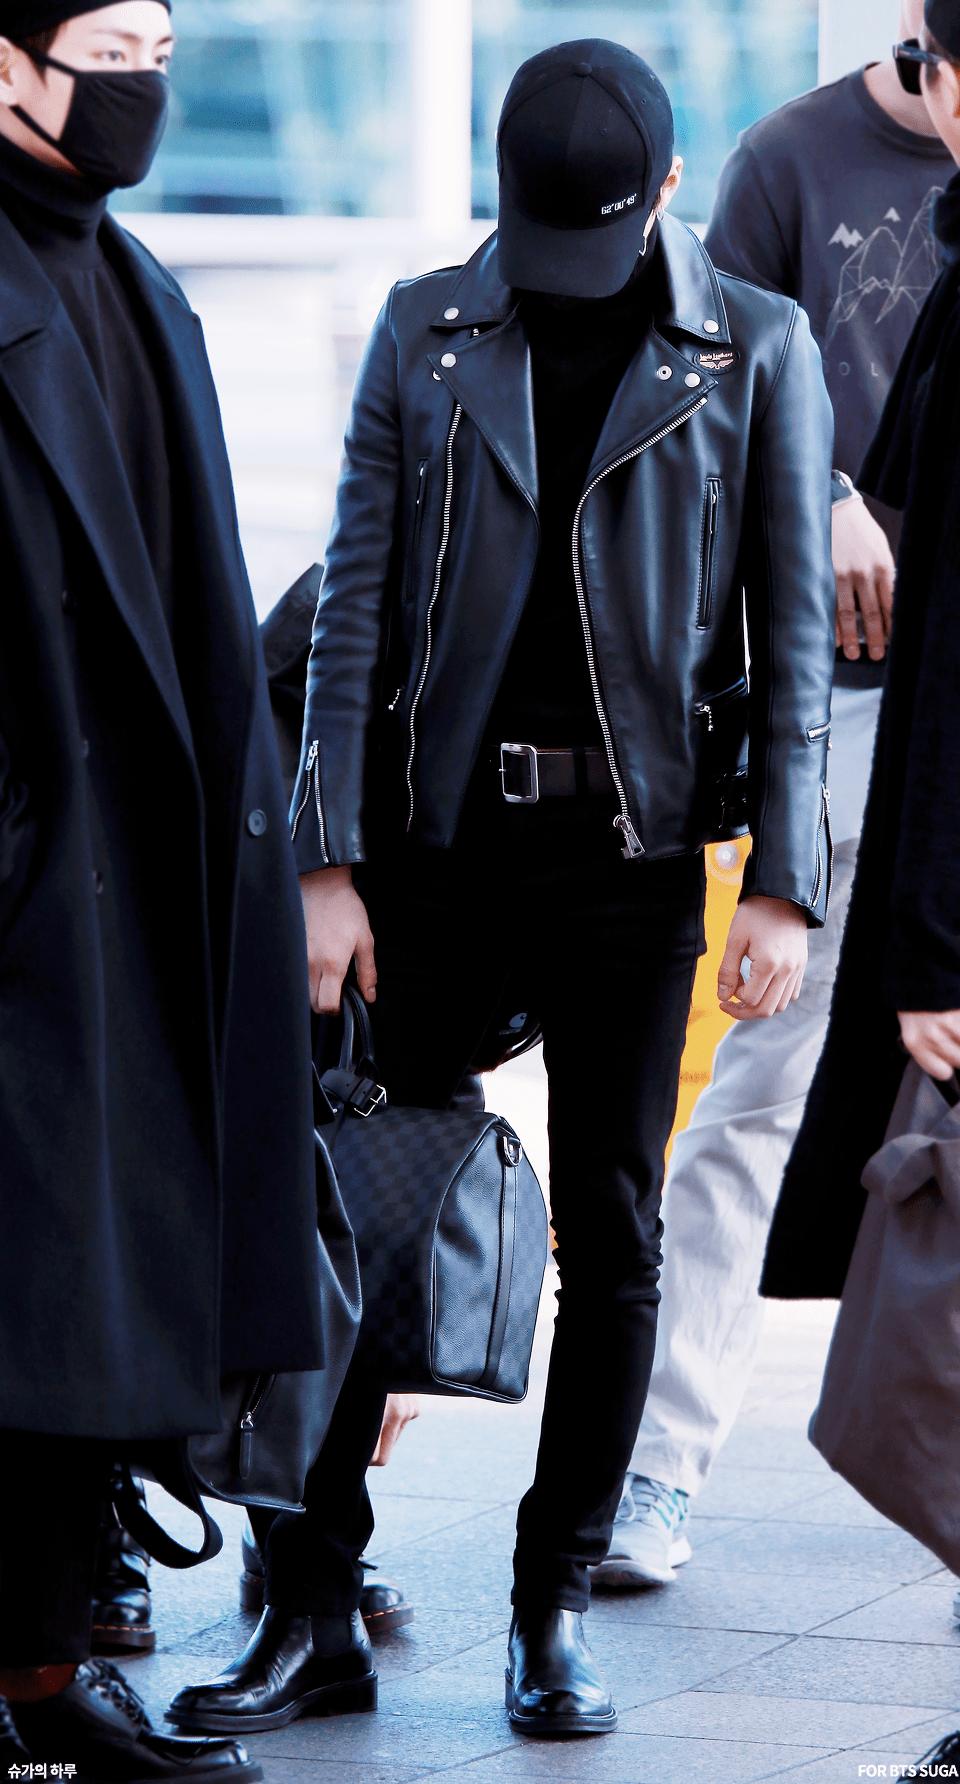 Korea Korean Kpop Idol Boy Band Group Bts Bangtan Yoongi Bts Suga S Black Airport Fashion Lea Jimin Airport Fashion Korean Airport Fashion Airport Fashion Kpop